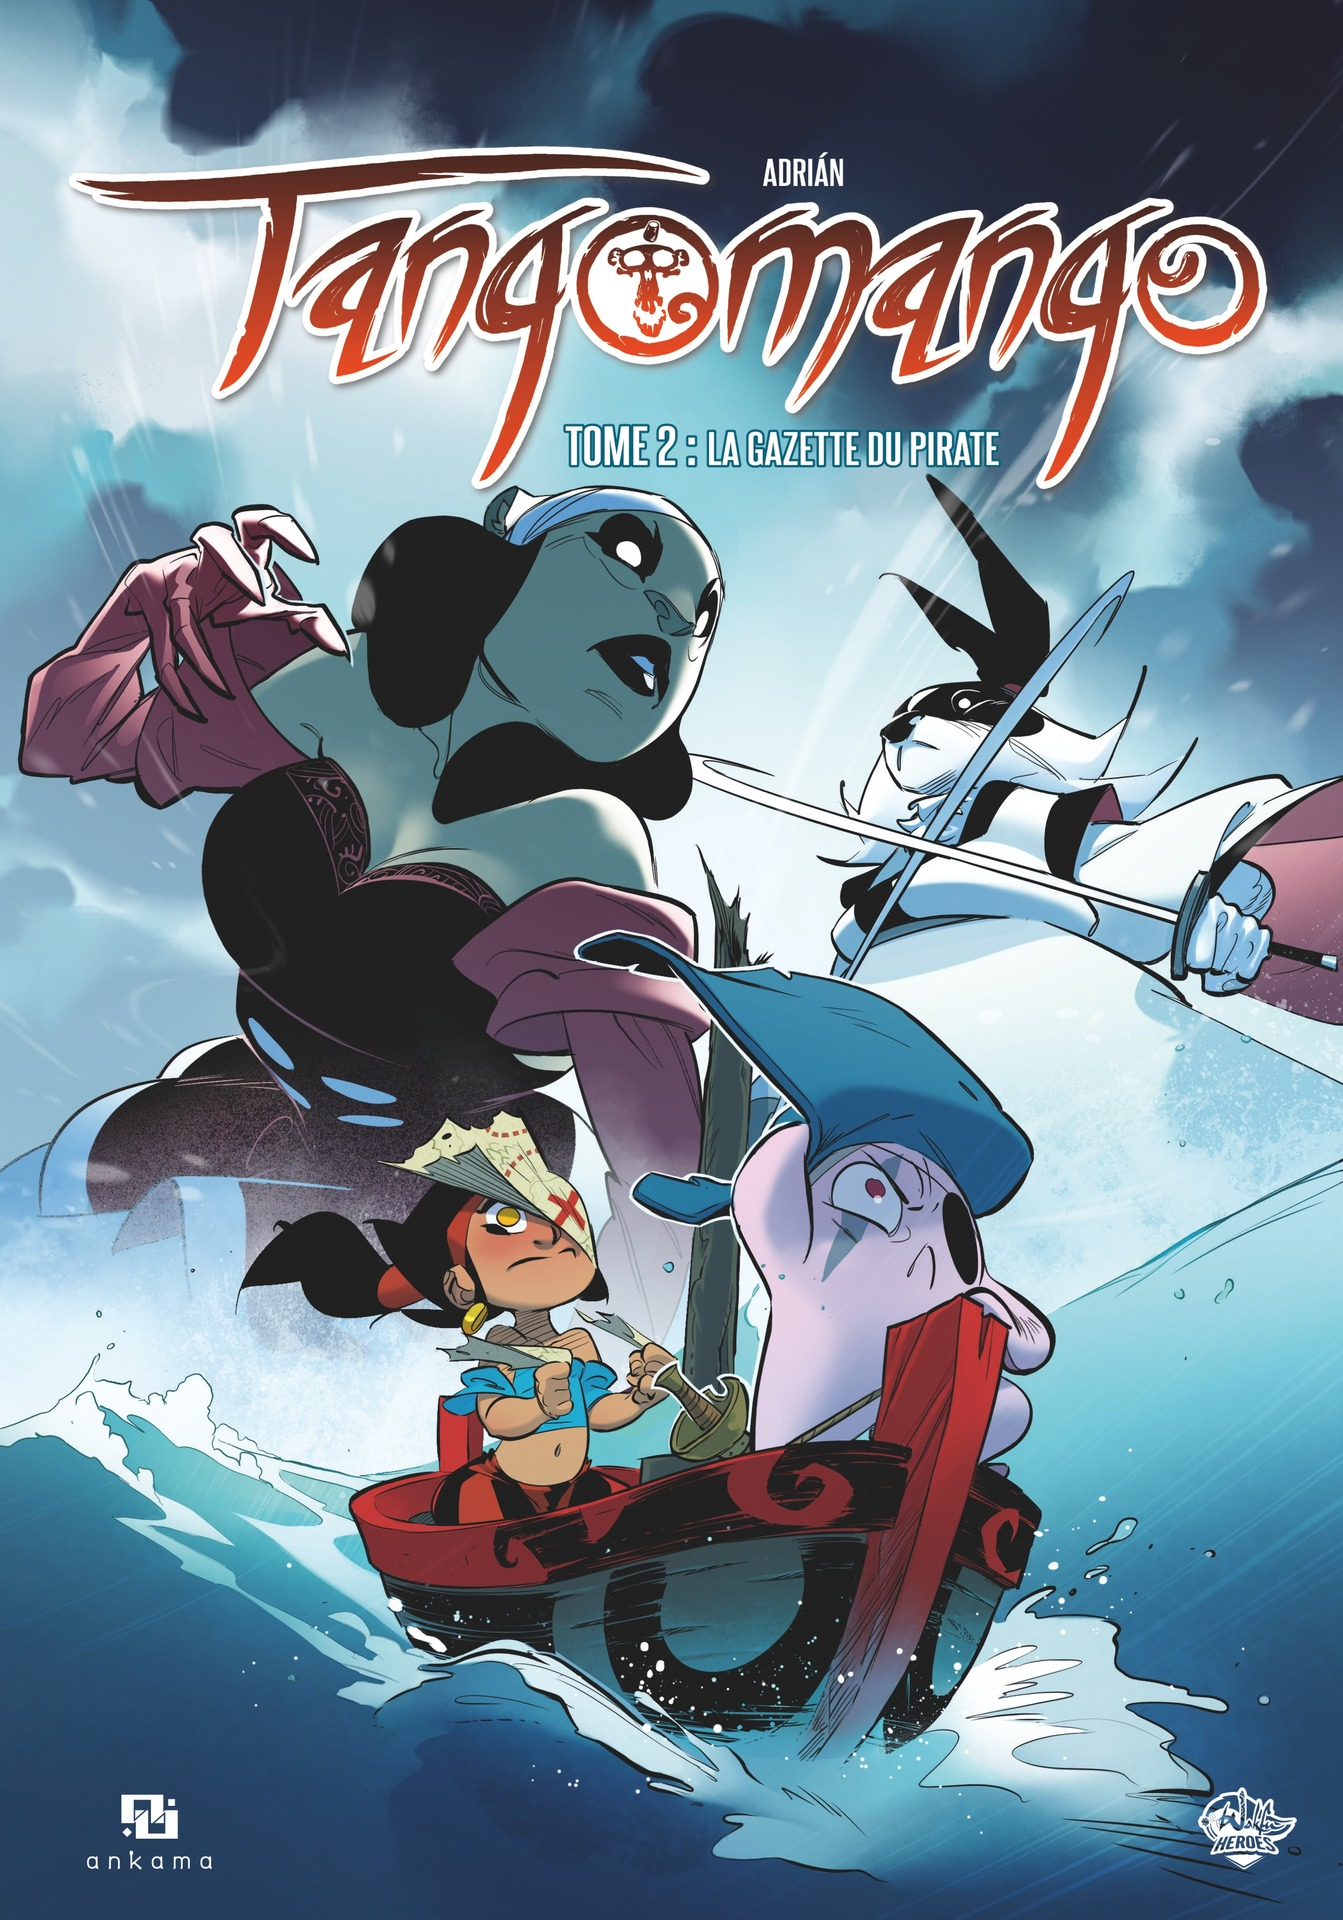 Tangomango - Tome 2 - La Gazette du pirate | Adriàn,